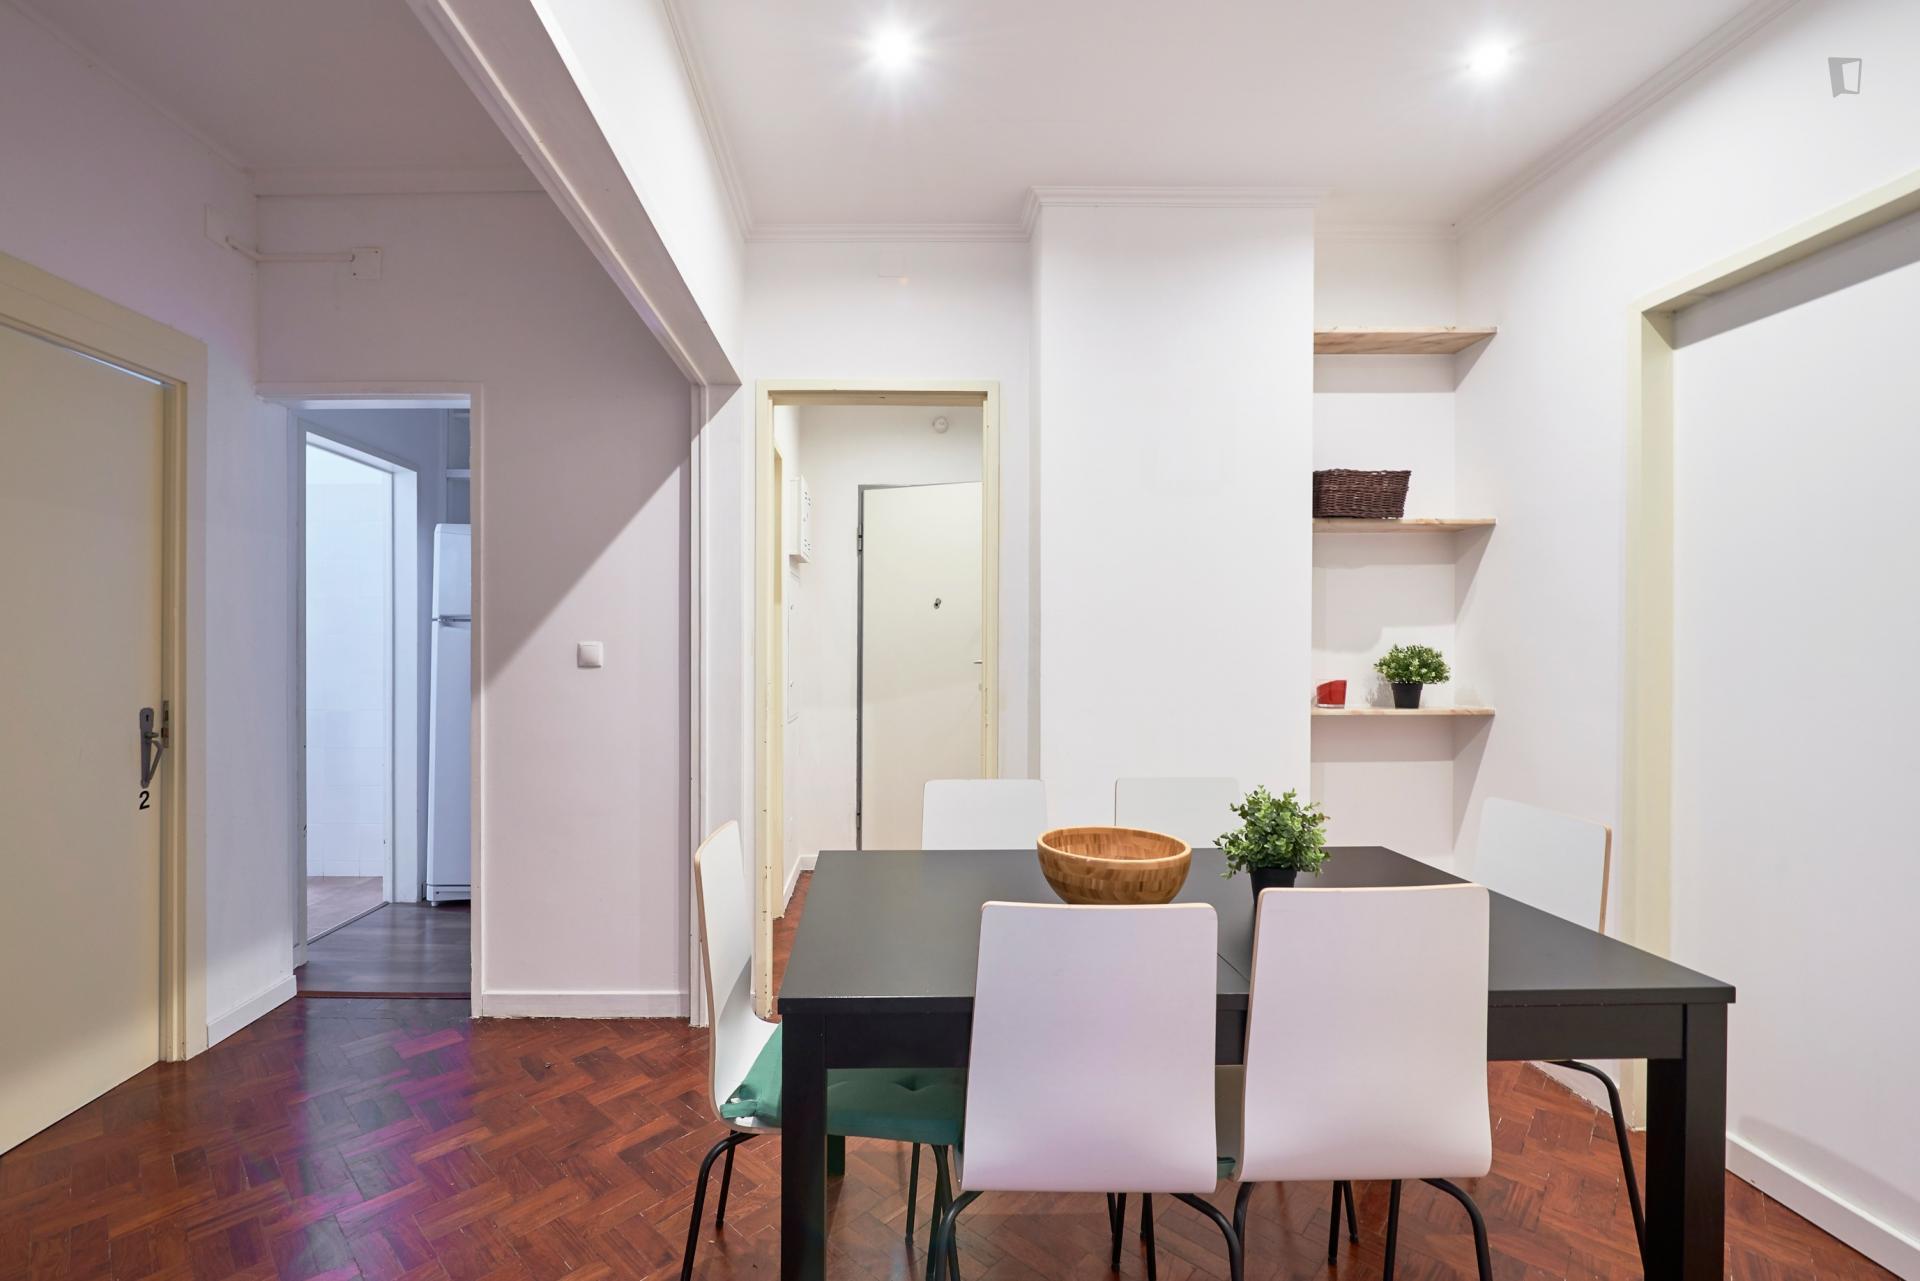 Bombarda- Bright shared flat in Lisbon